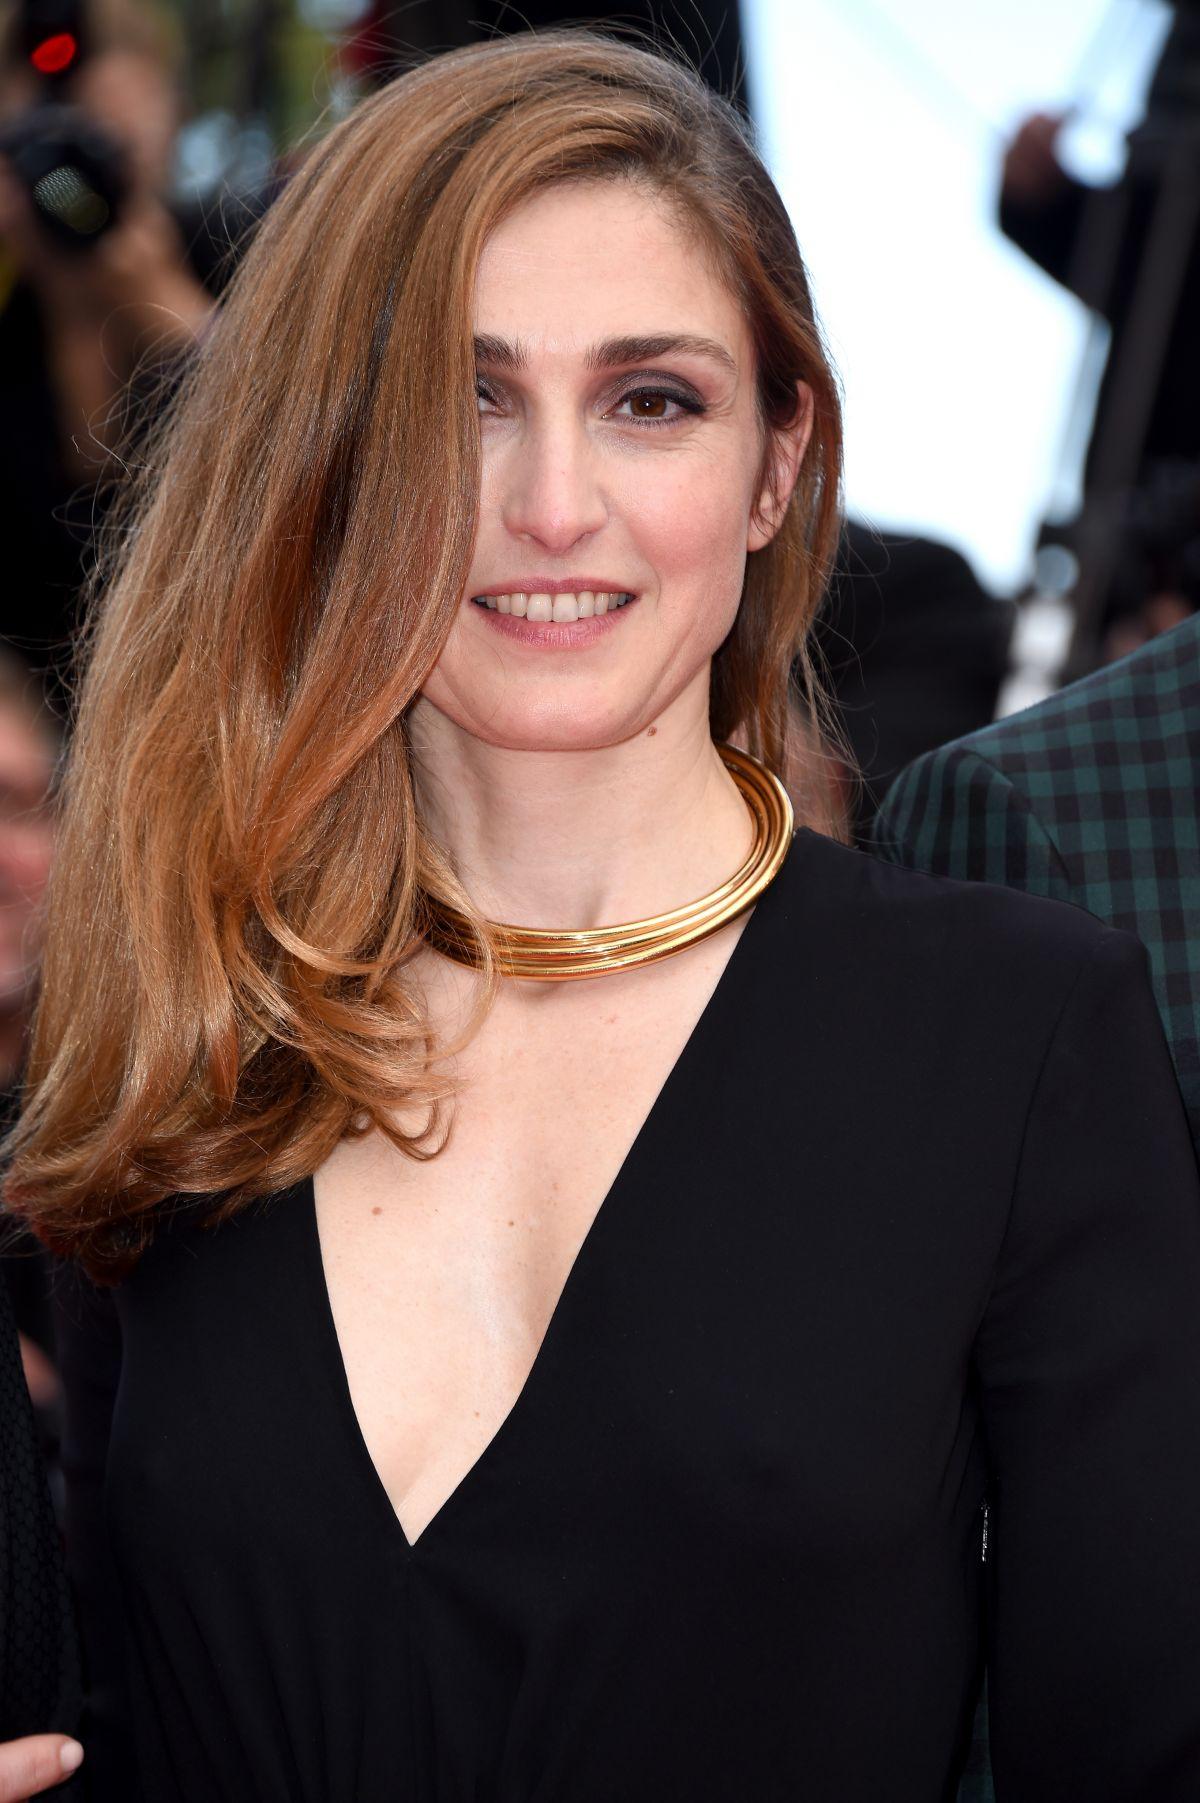 JULIE GAYET at Saint Laurent Premiere at Cannes Film Festival